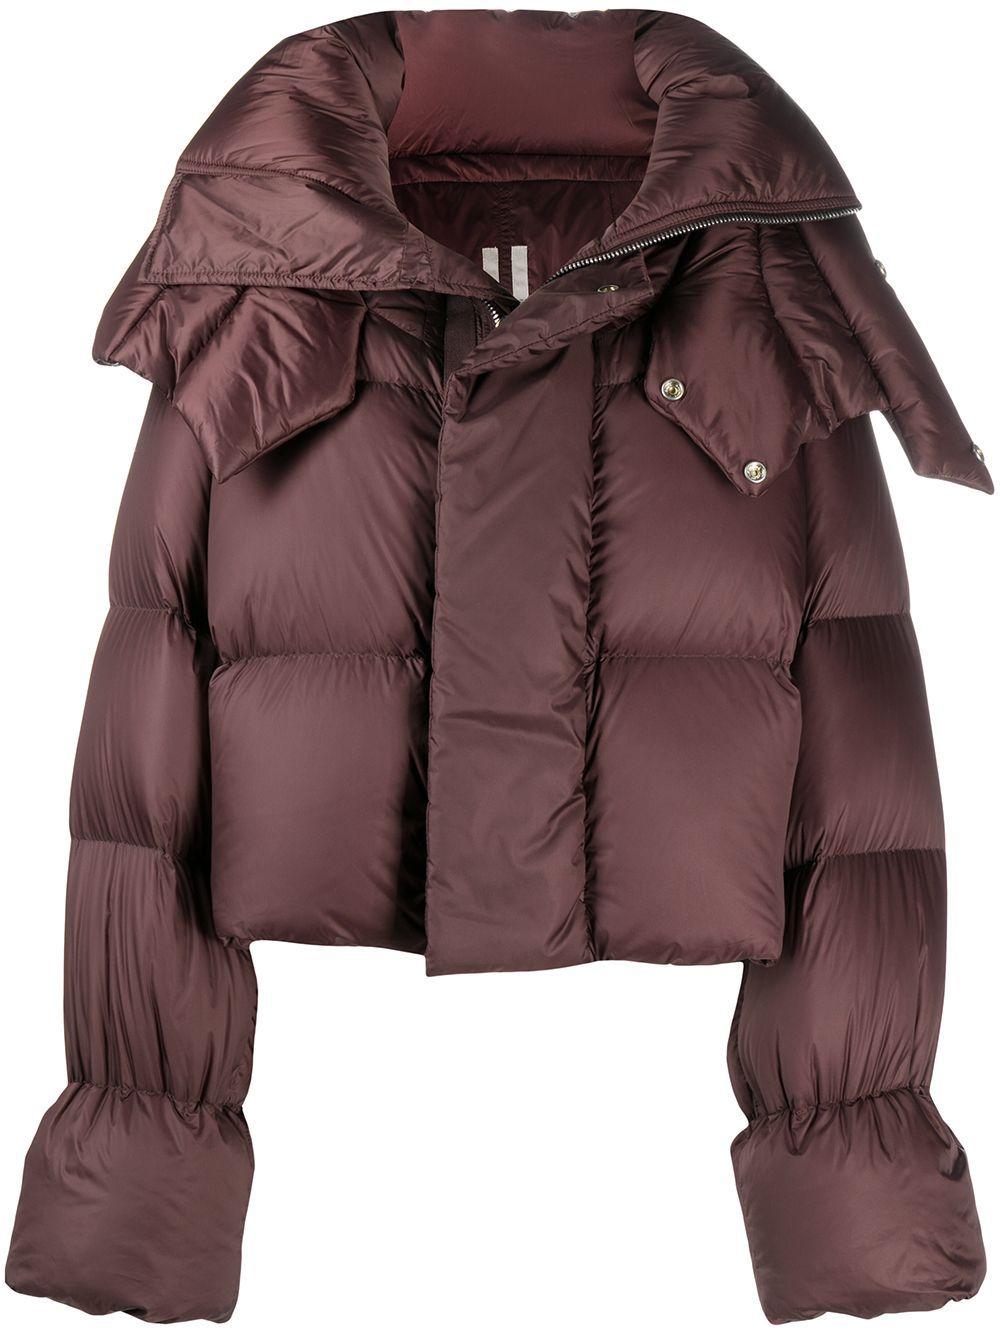 Rick Owens Cropped Puffer Jacket Farfetch Cropped Puffer Jacket Puffer Jackets Rick Owens [ 1334 x 1000 Pixel ]